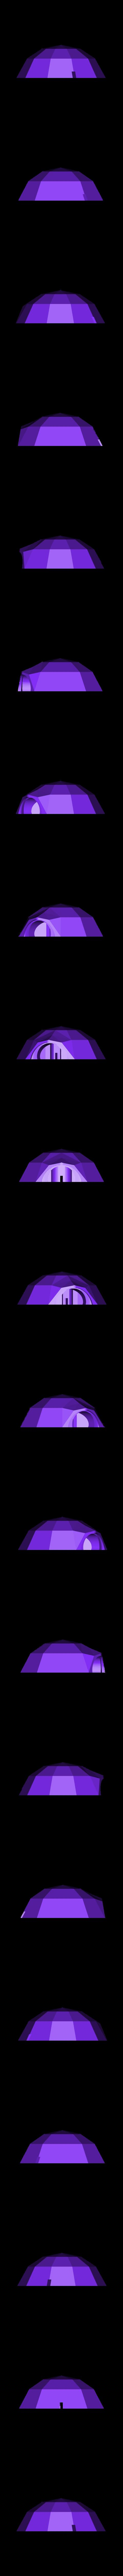 Low_poly_Top.STL Download free STL file Squishy Turtle • 3D print template, jakejake